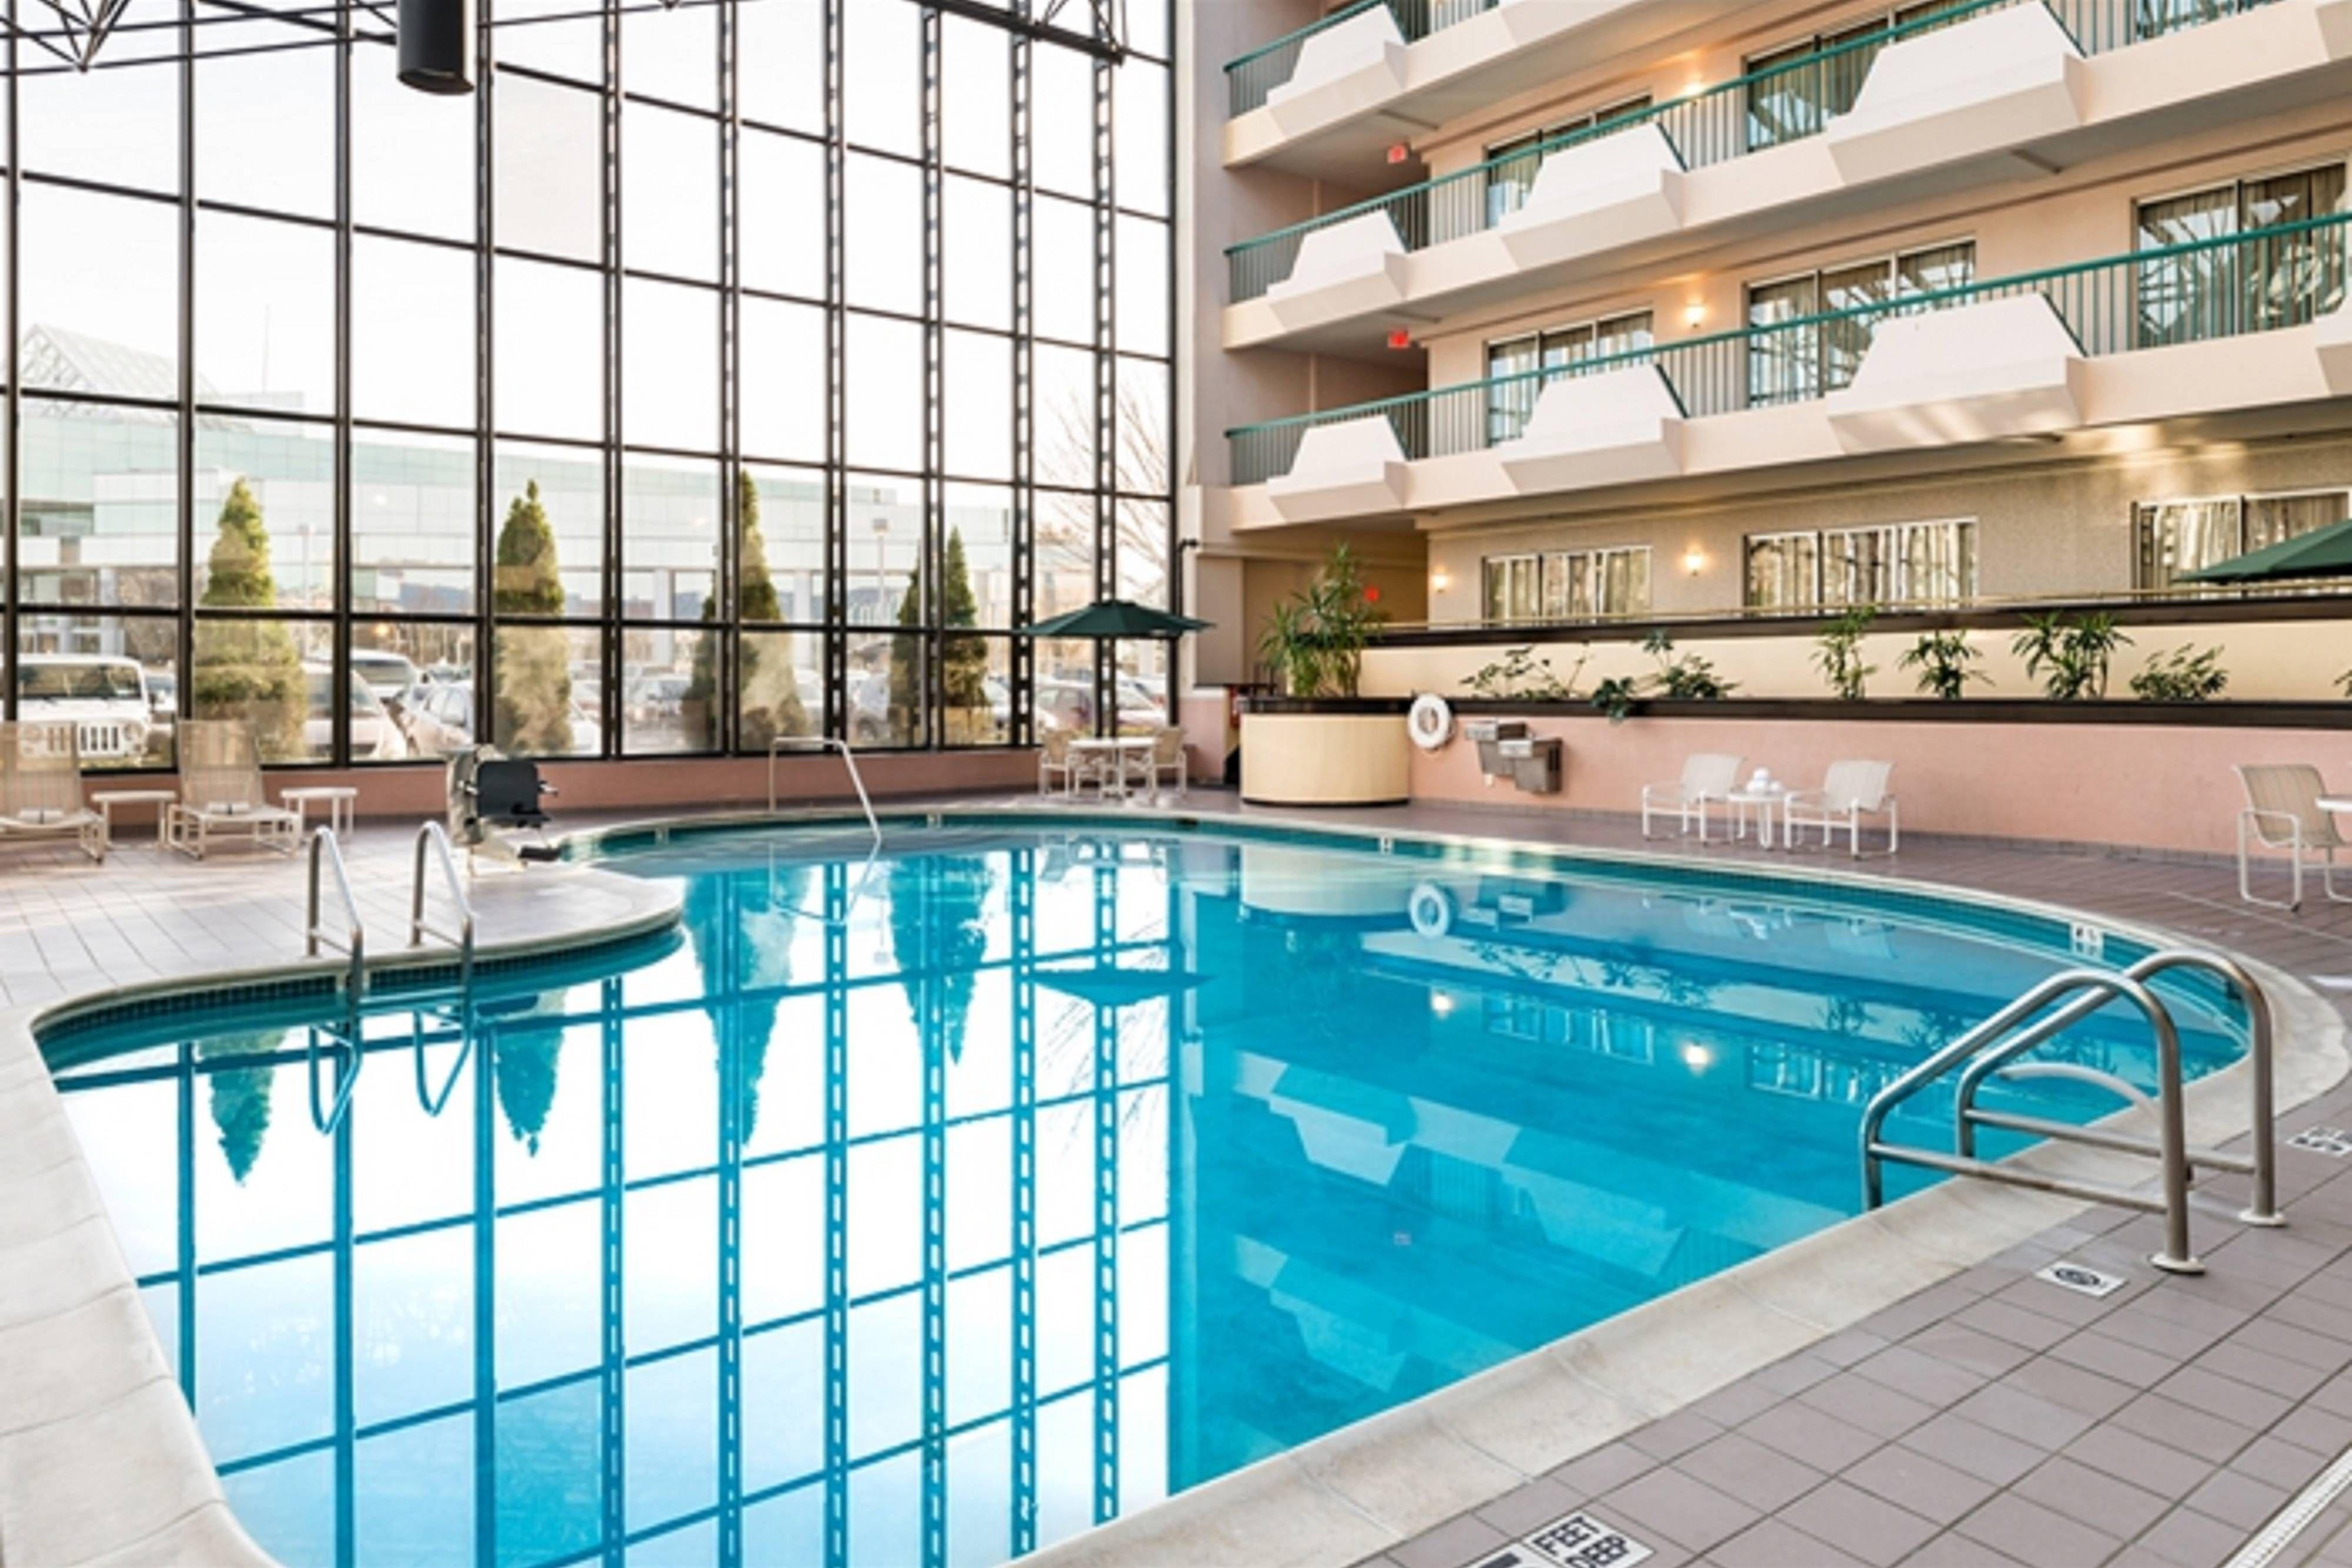 Melville Marriott Long Island Indoor Pool Guestroom Beautiful Hotels Modern Hotel Modern Hotel Room Indoor Pool